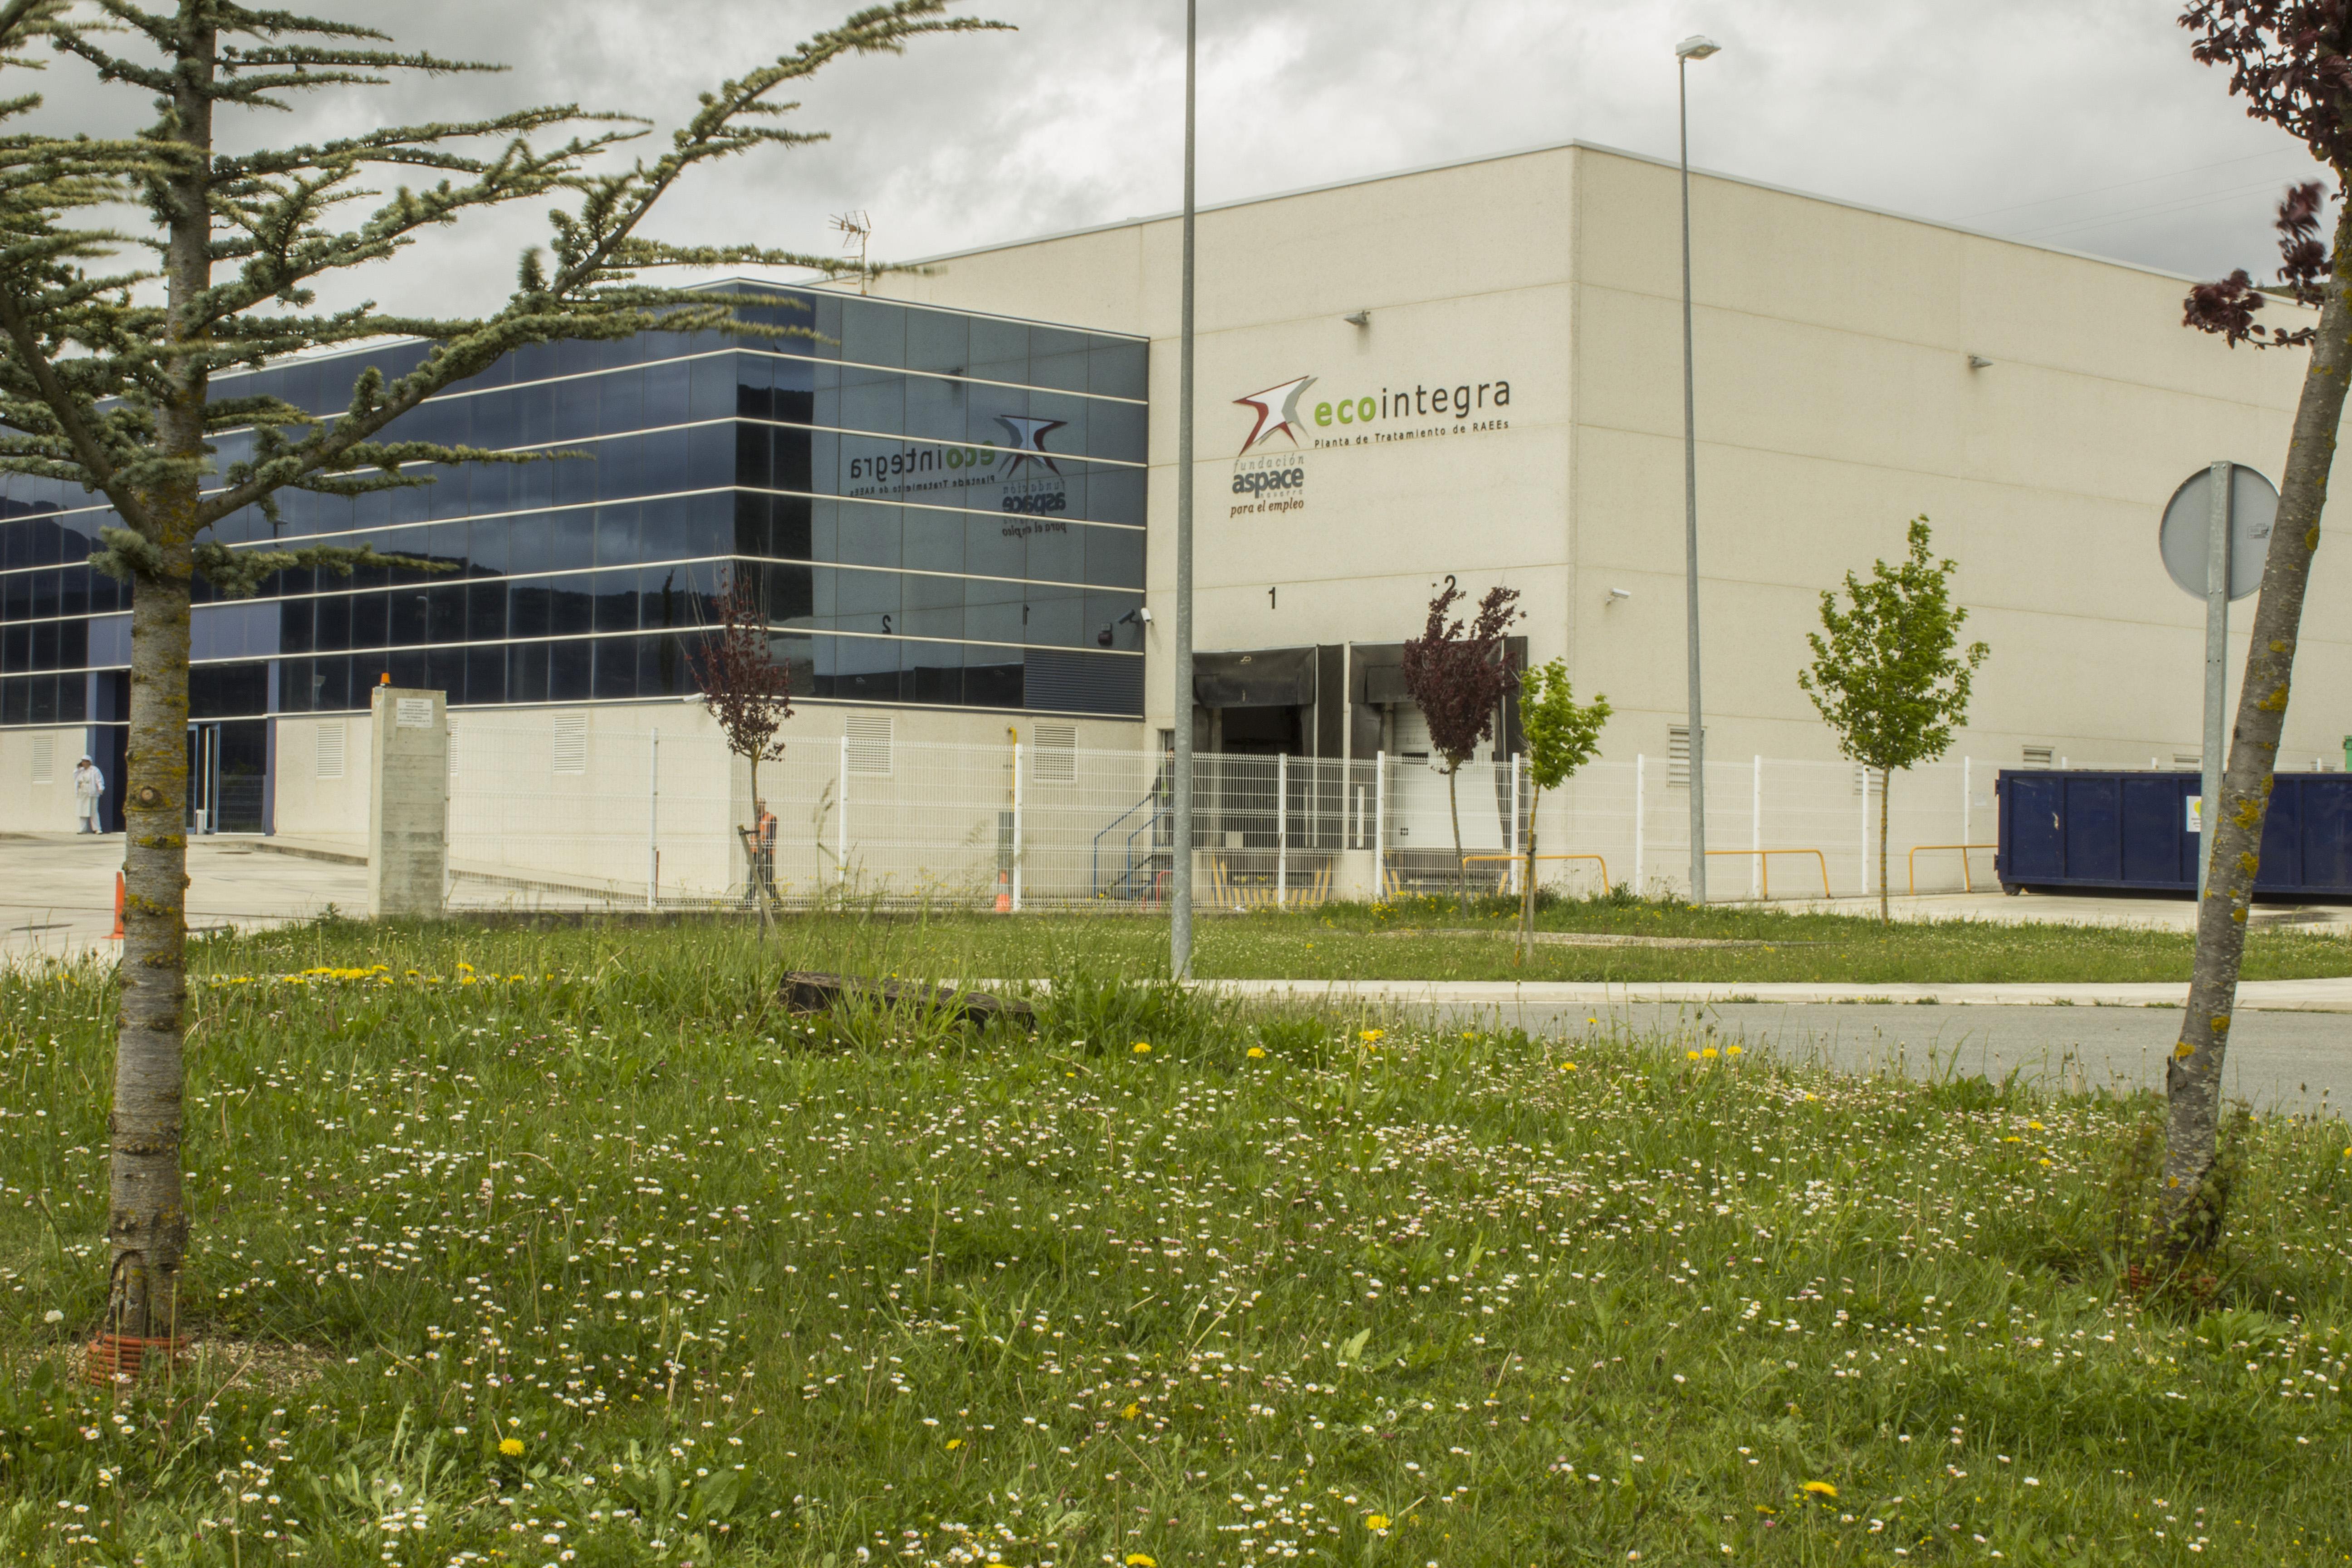 Imagen exterior de la factoría de Ecointegra en Aoiz.